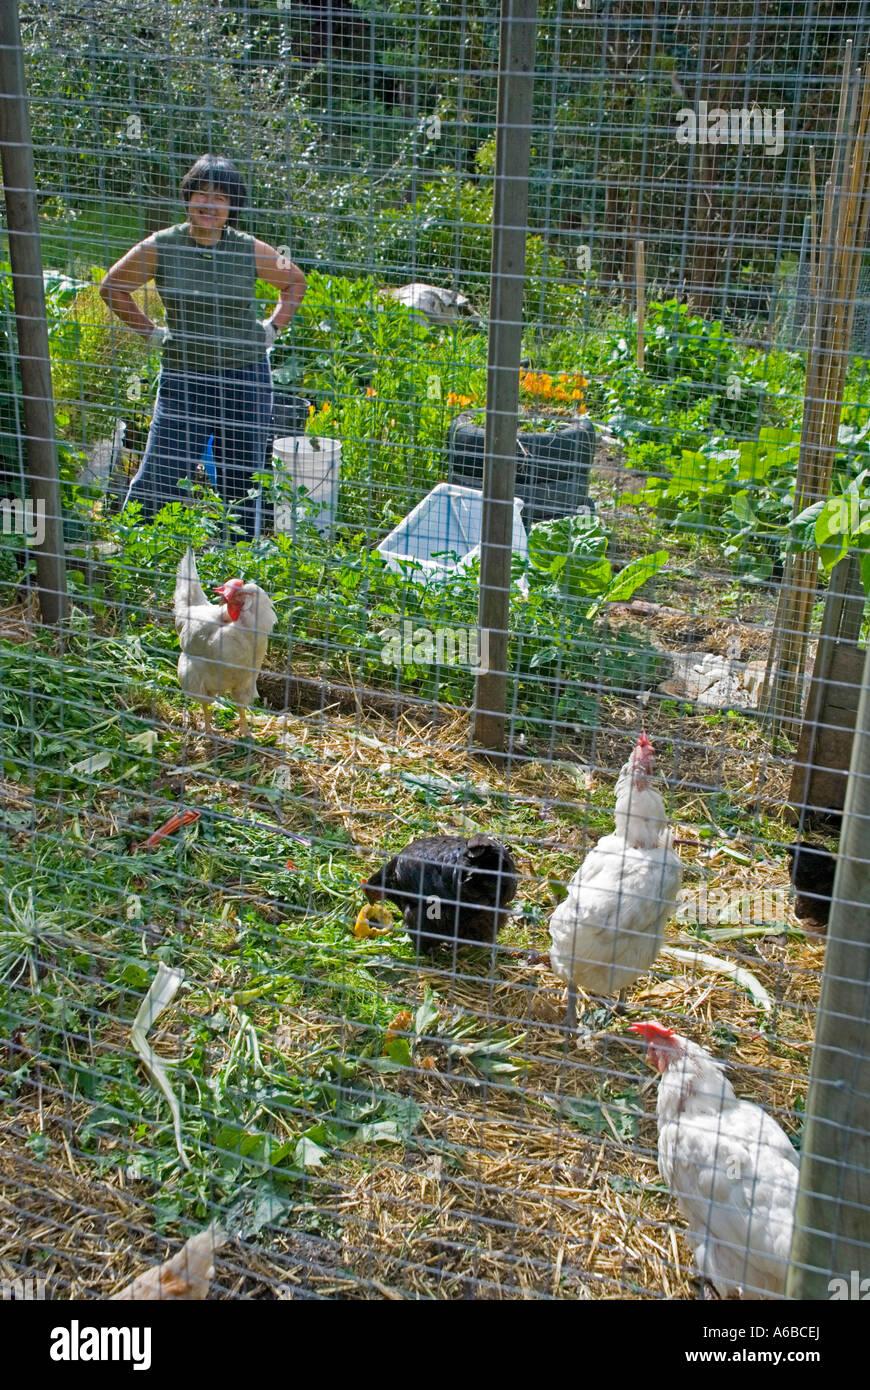 Woman Garden Gardening Hens Chickens Stock Photos & Woman